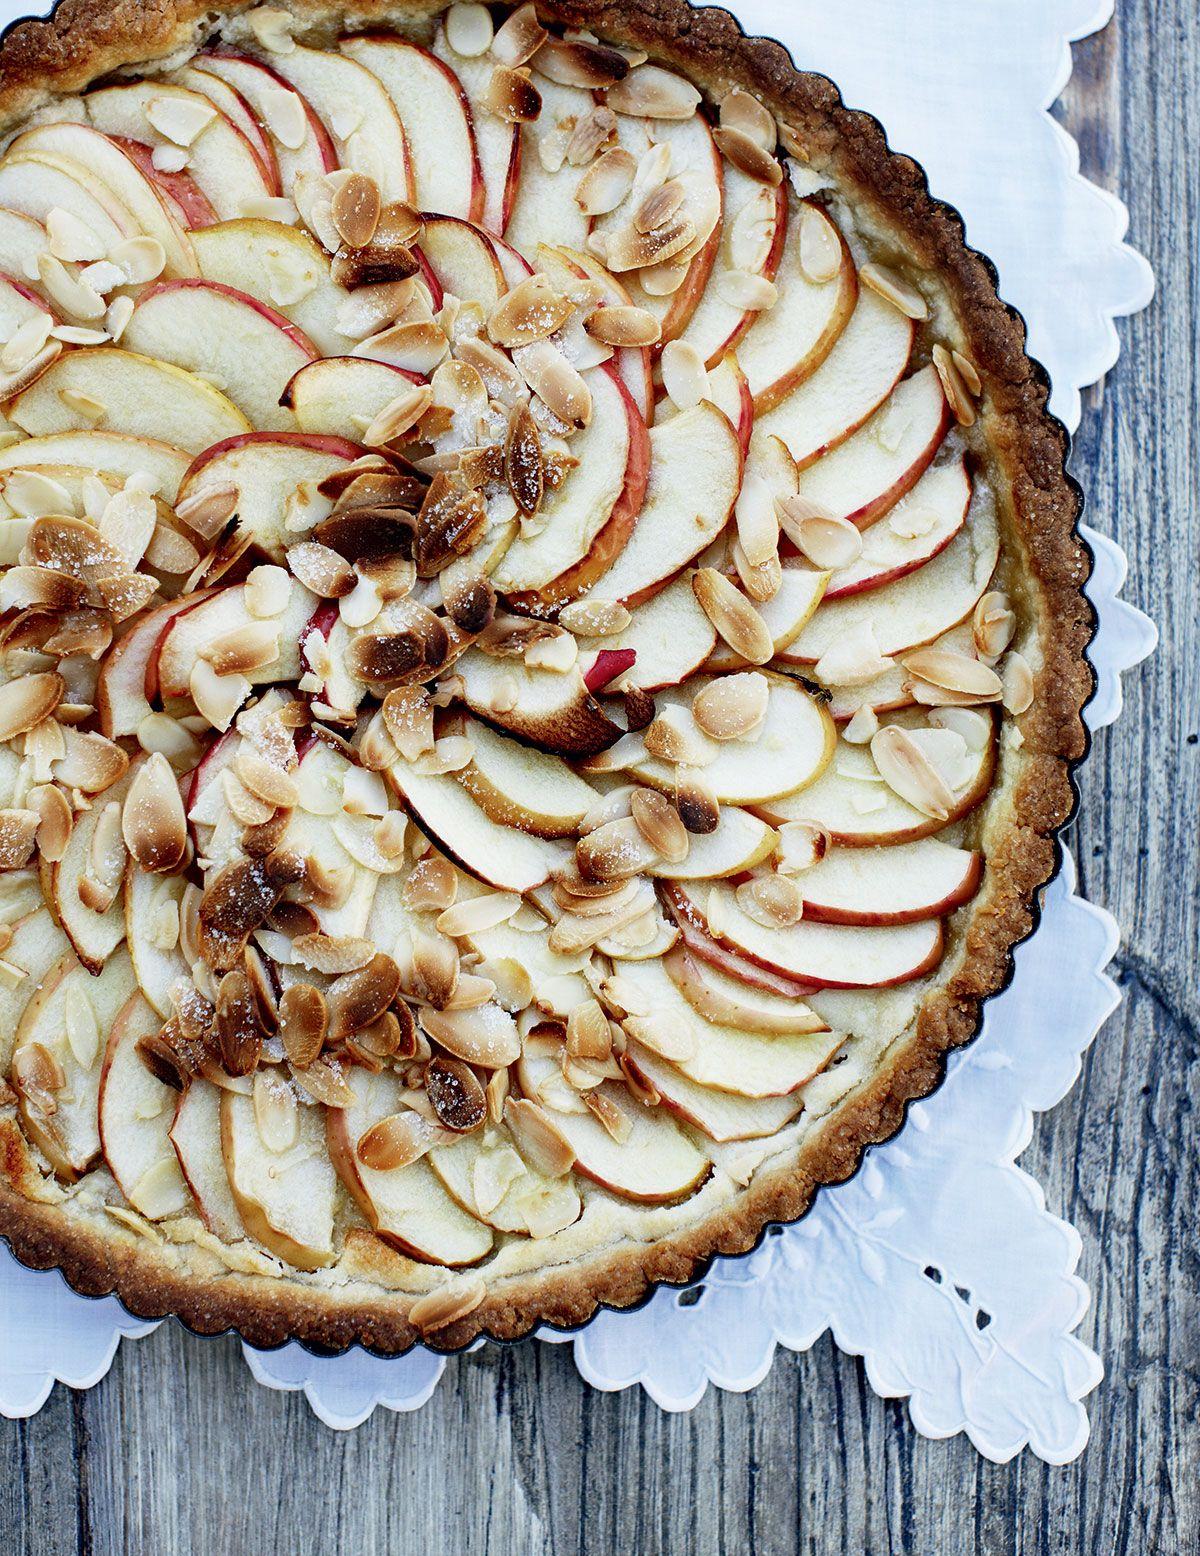 Resepti: Omenatorttu ja mantelikreemi